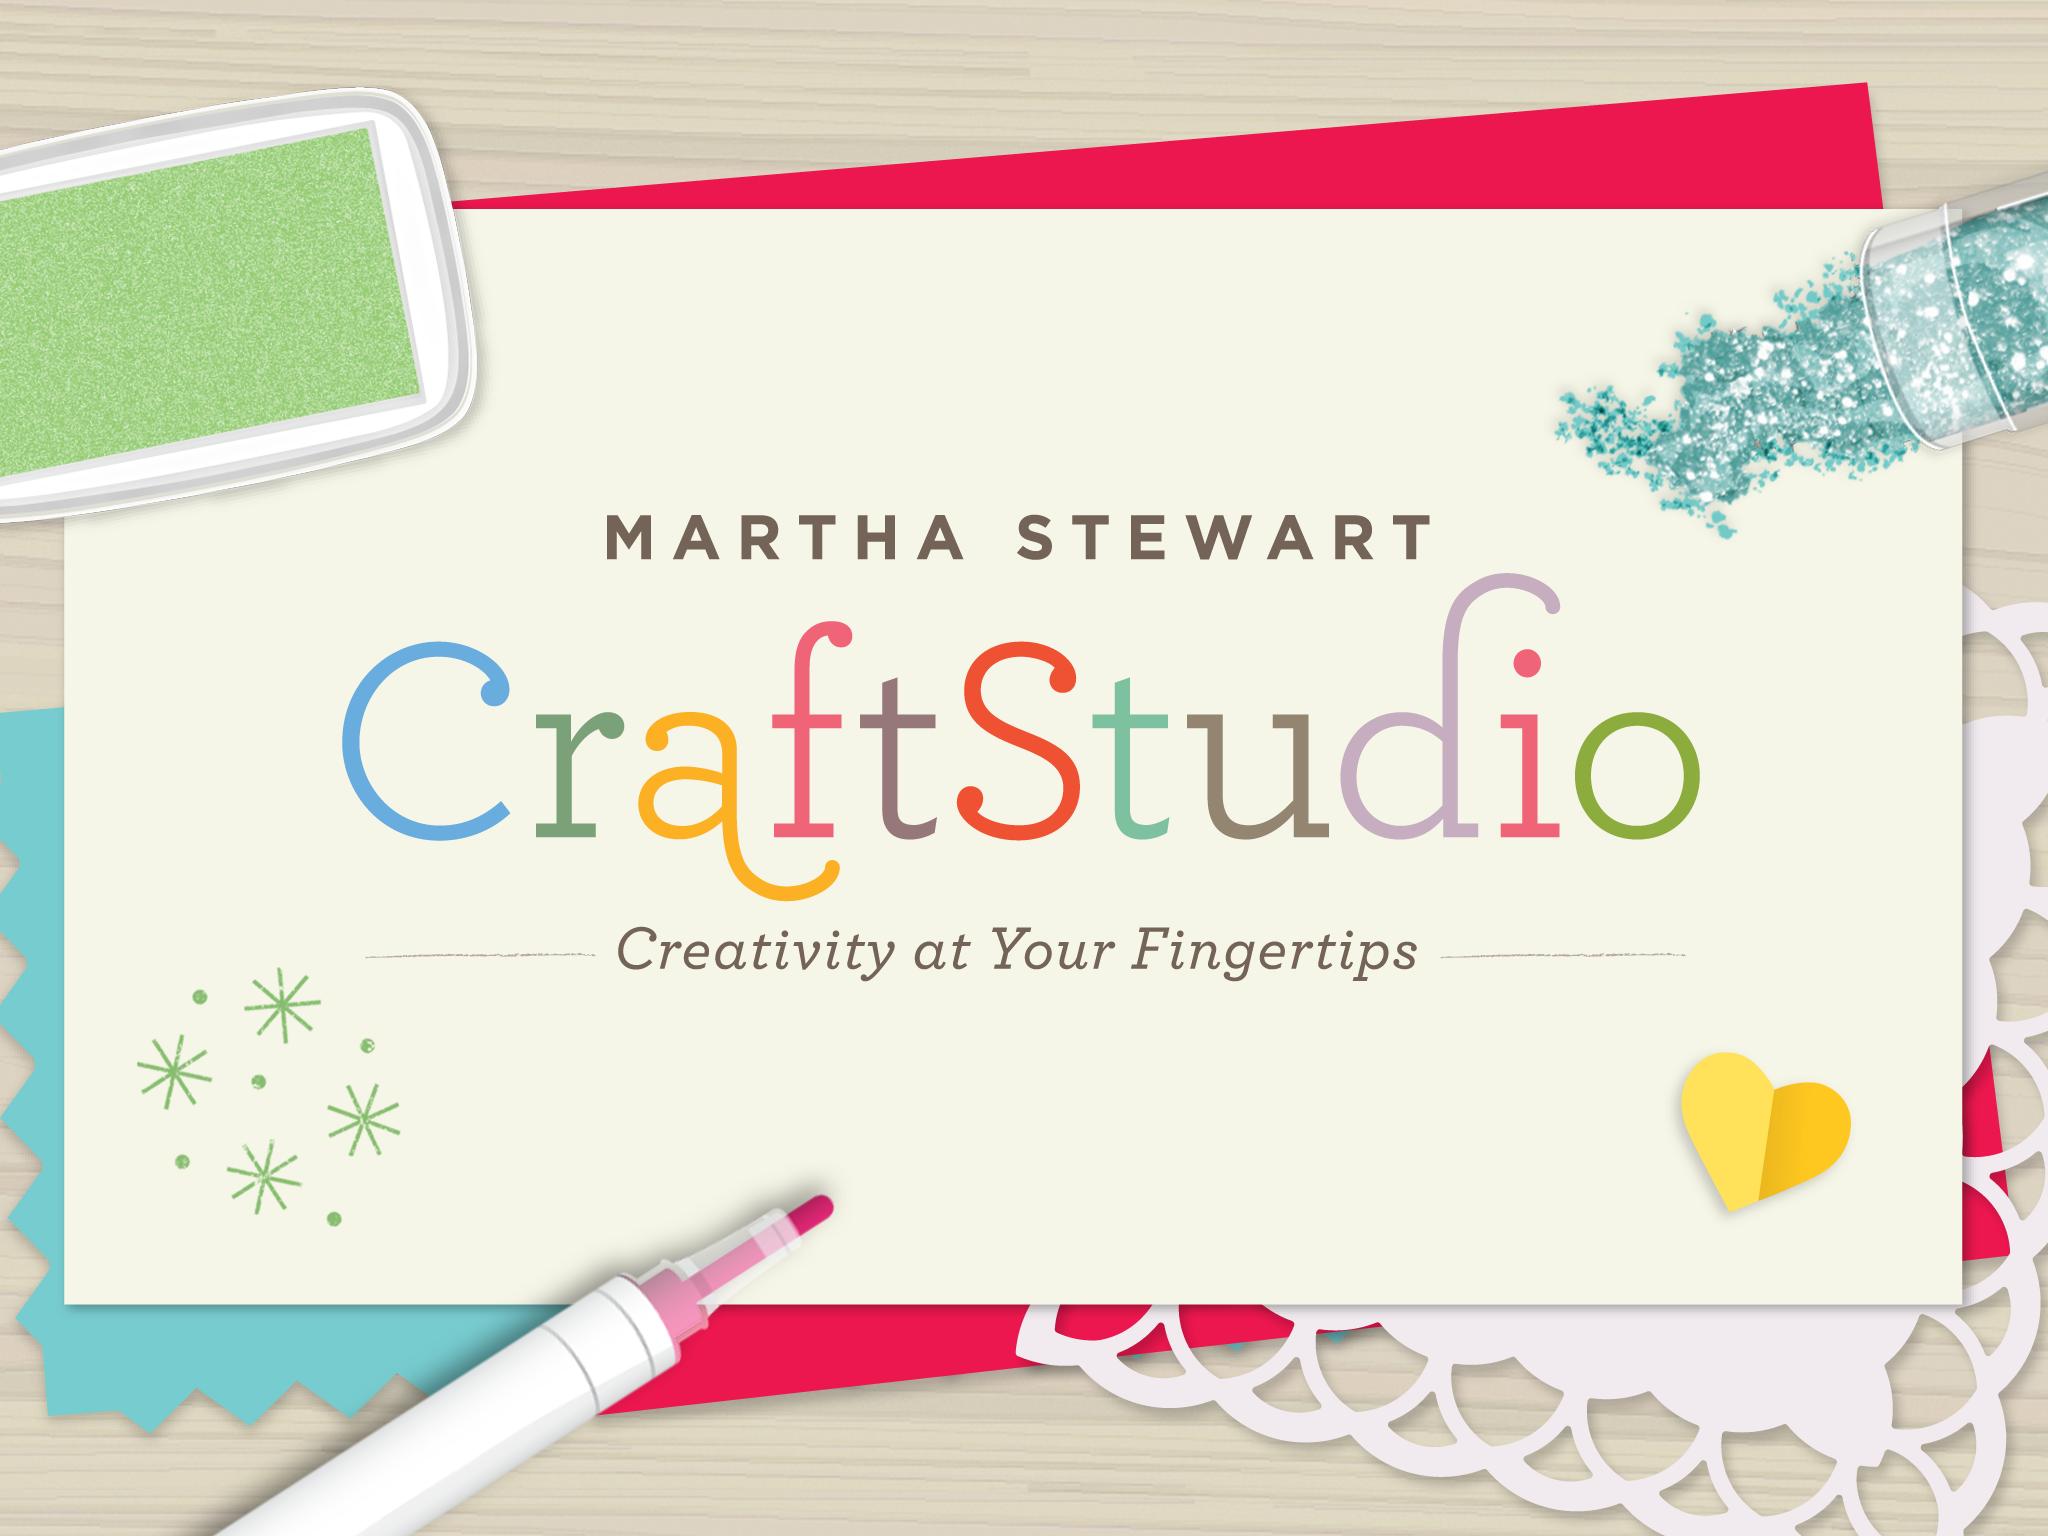 craftstudio_homepagewithoutipad.png